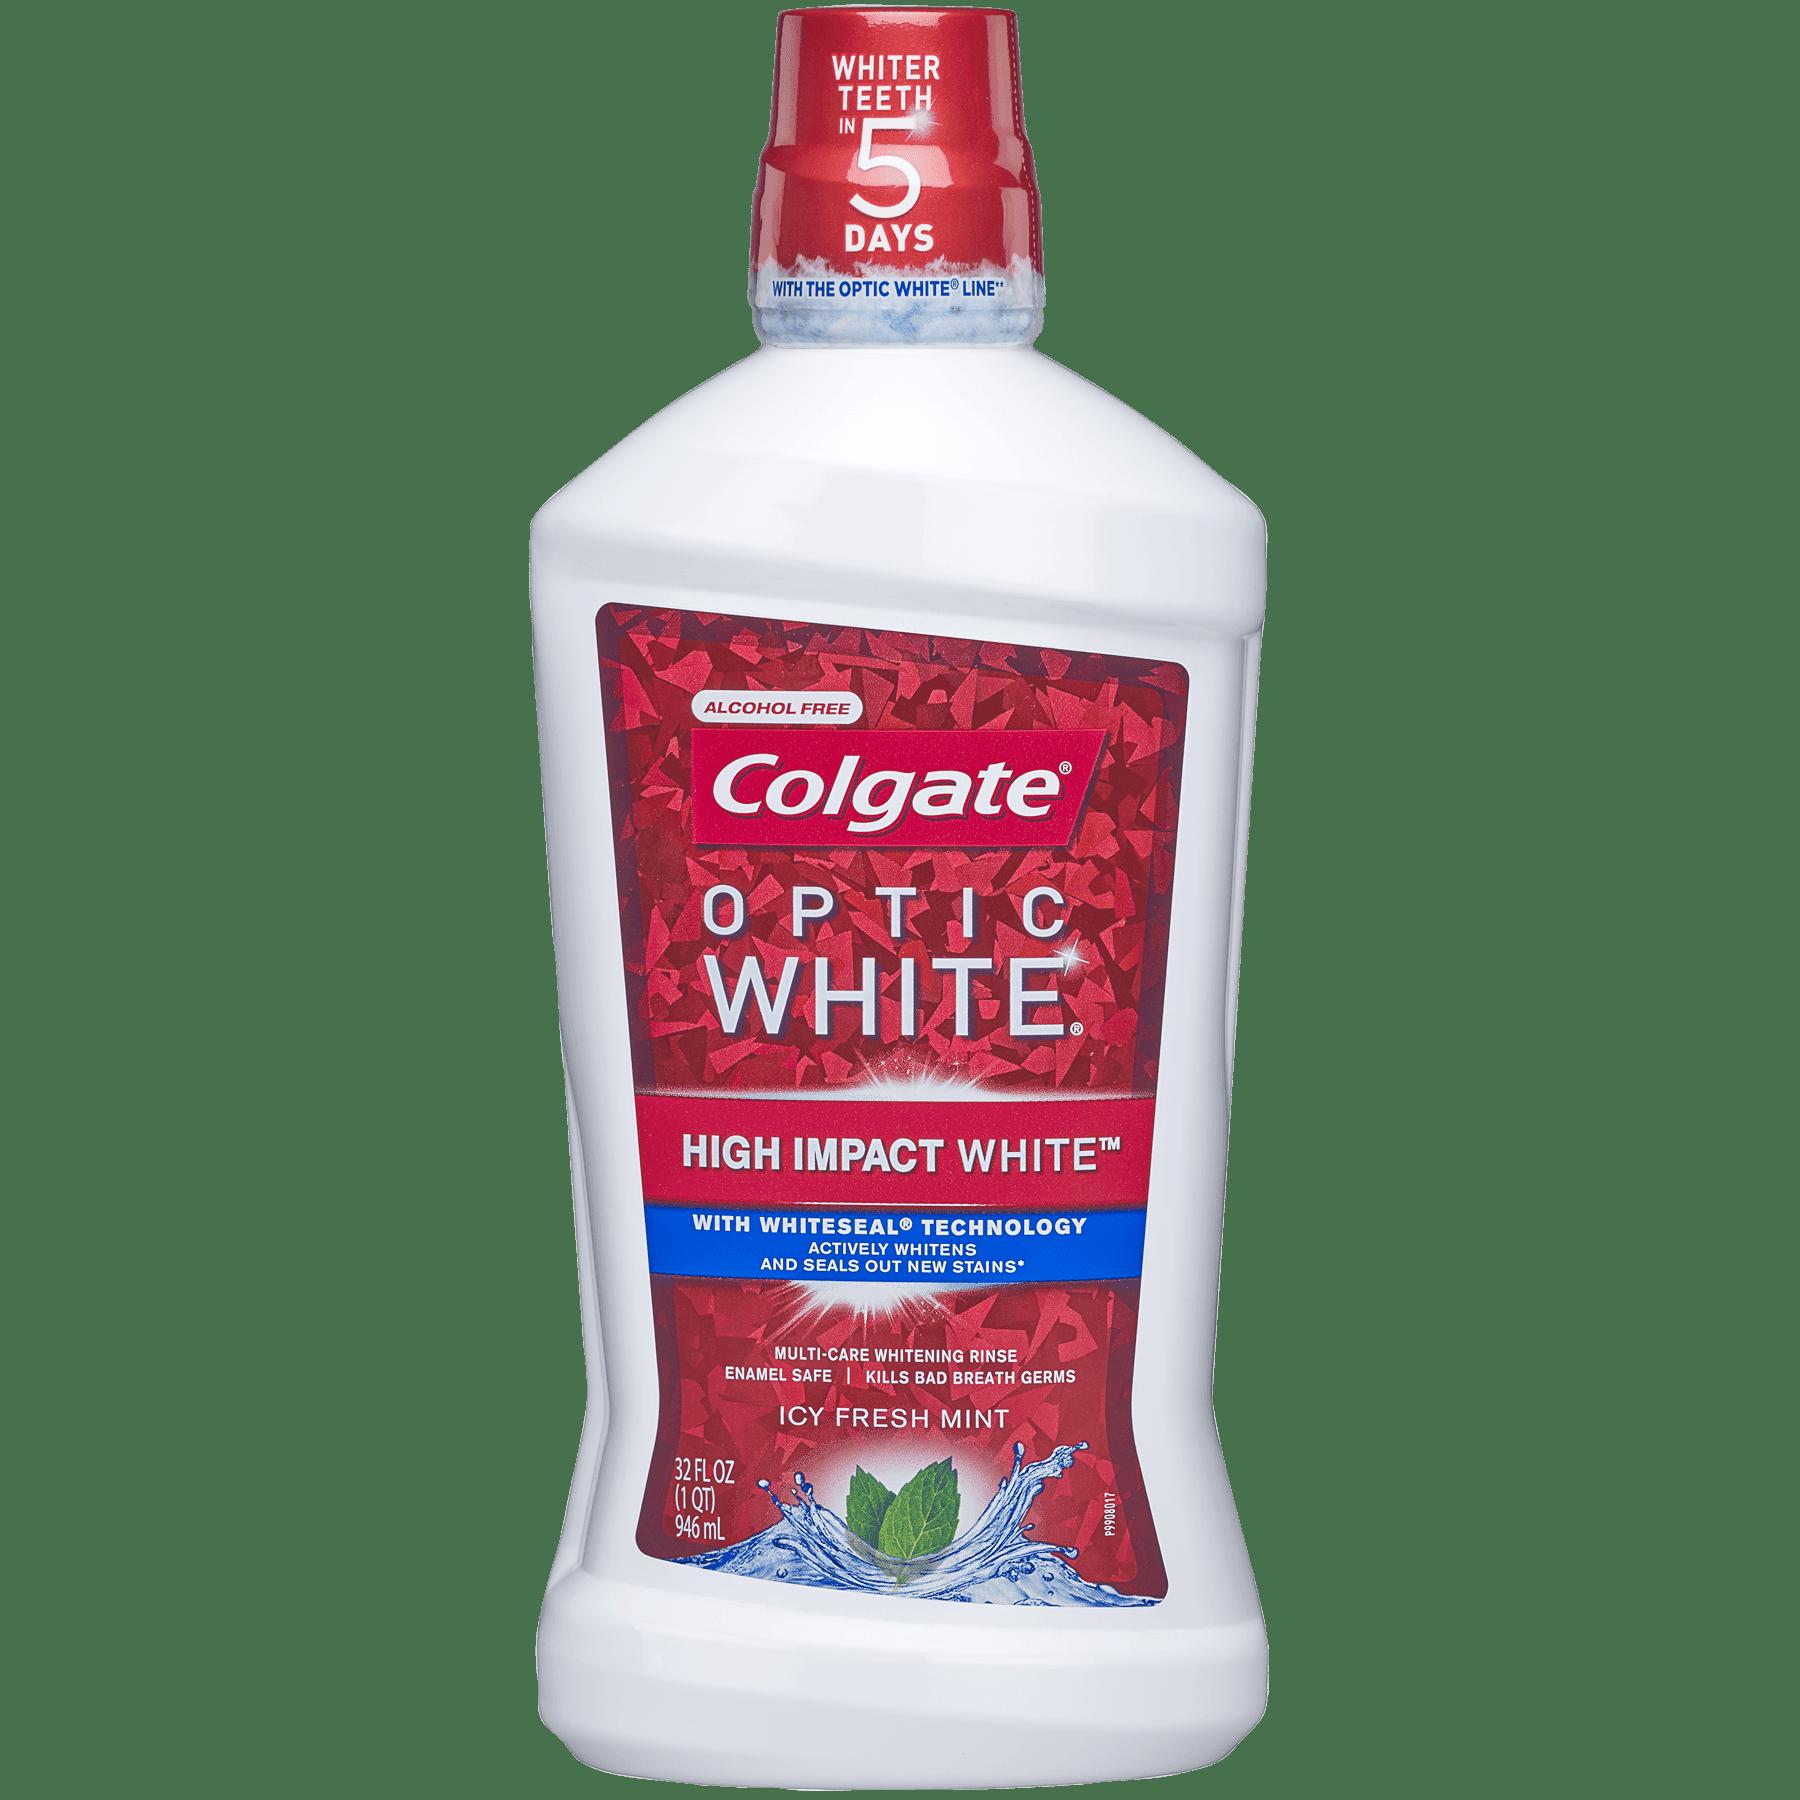 Colgate Optic White Whitening Mouthwash, Fresh Mint - 946mL, 32 fl oz